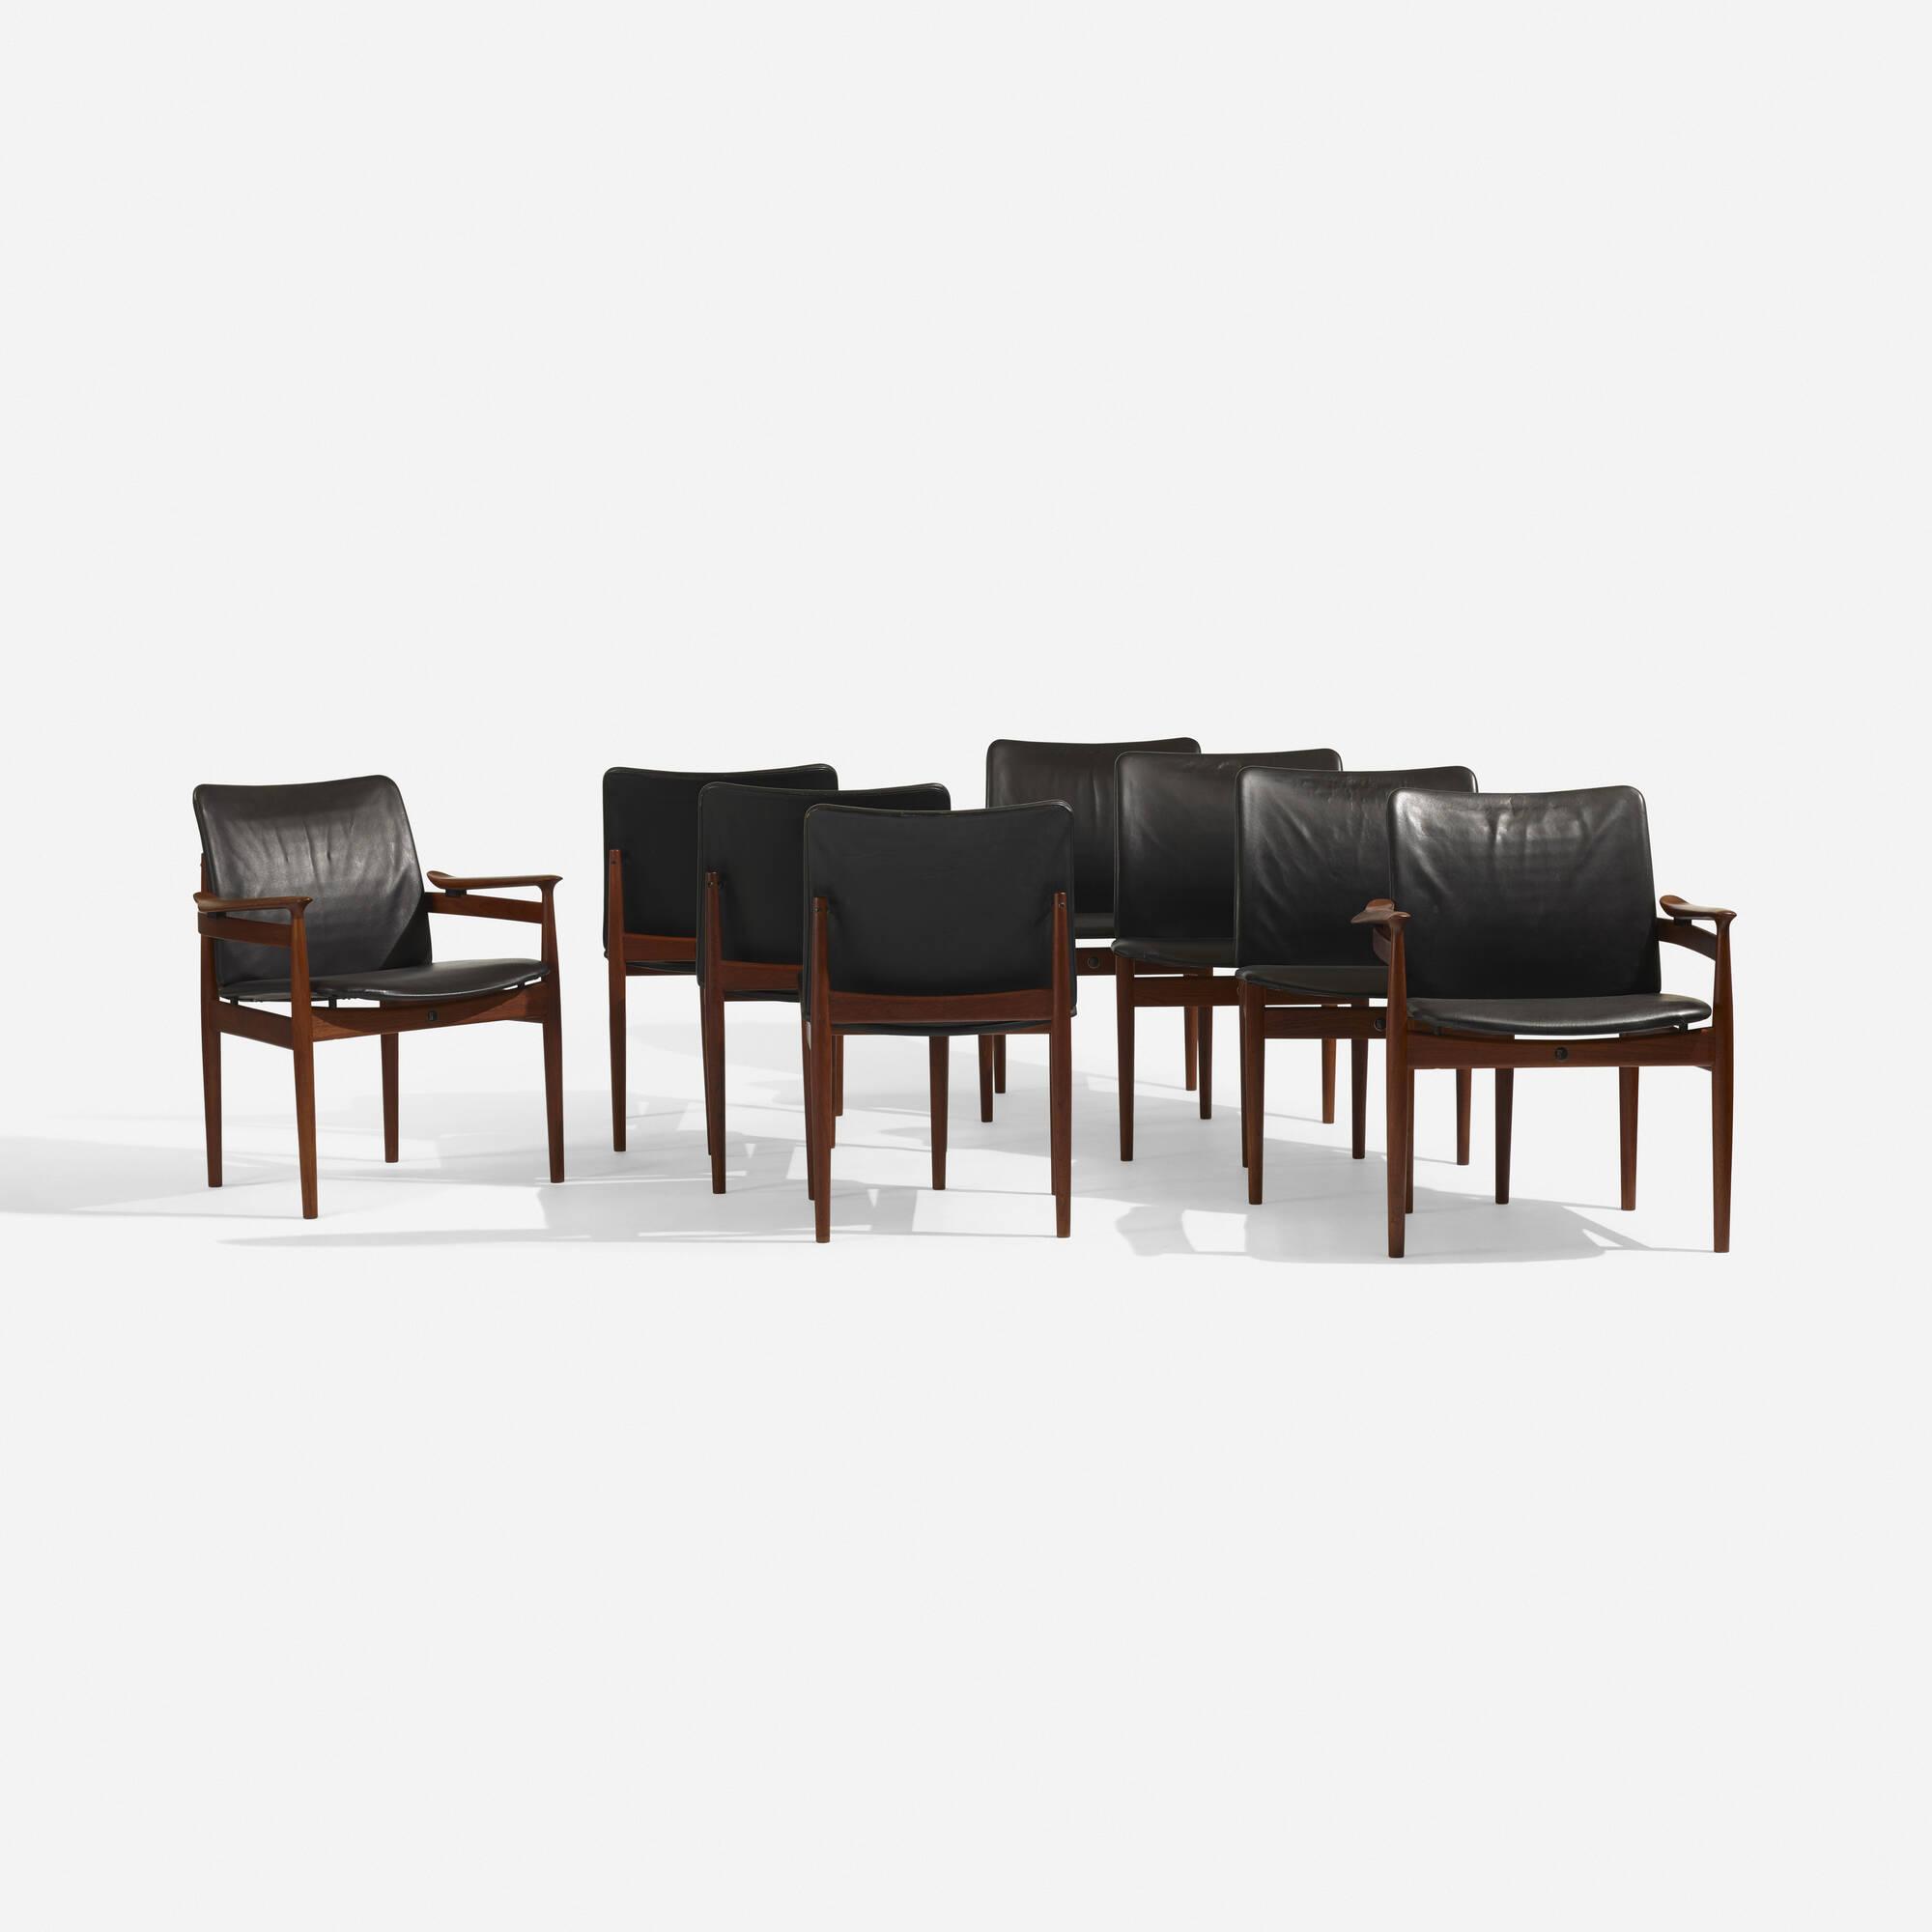 298: Finn Juhl / chairs, set of eight (1 of 5)